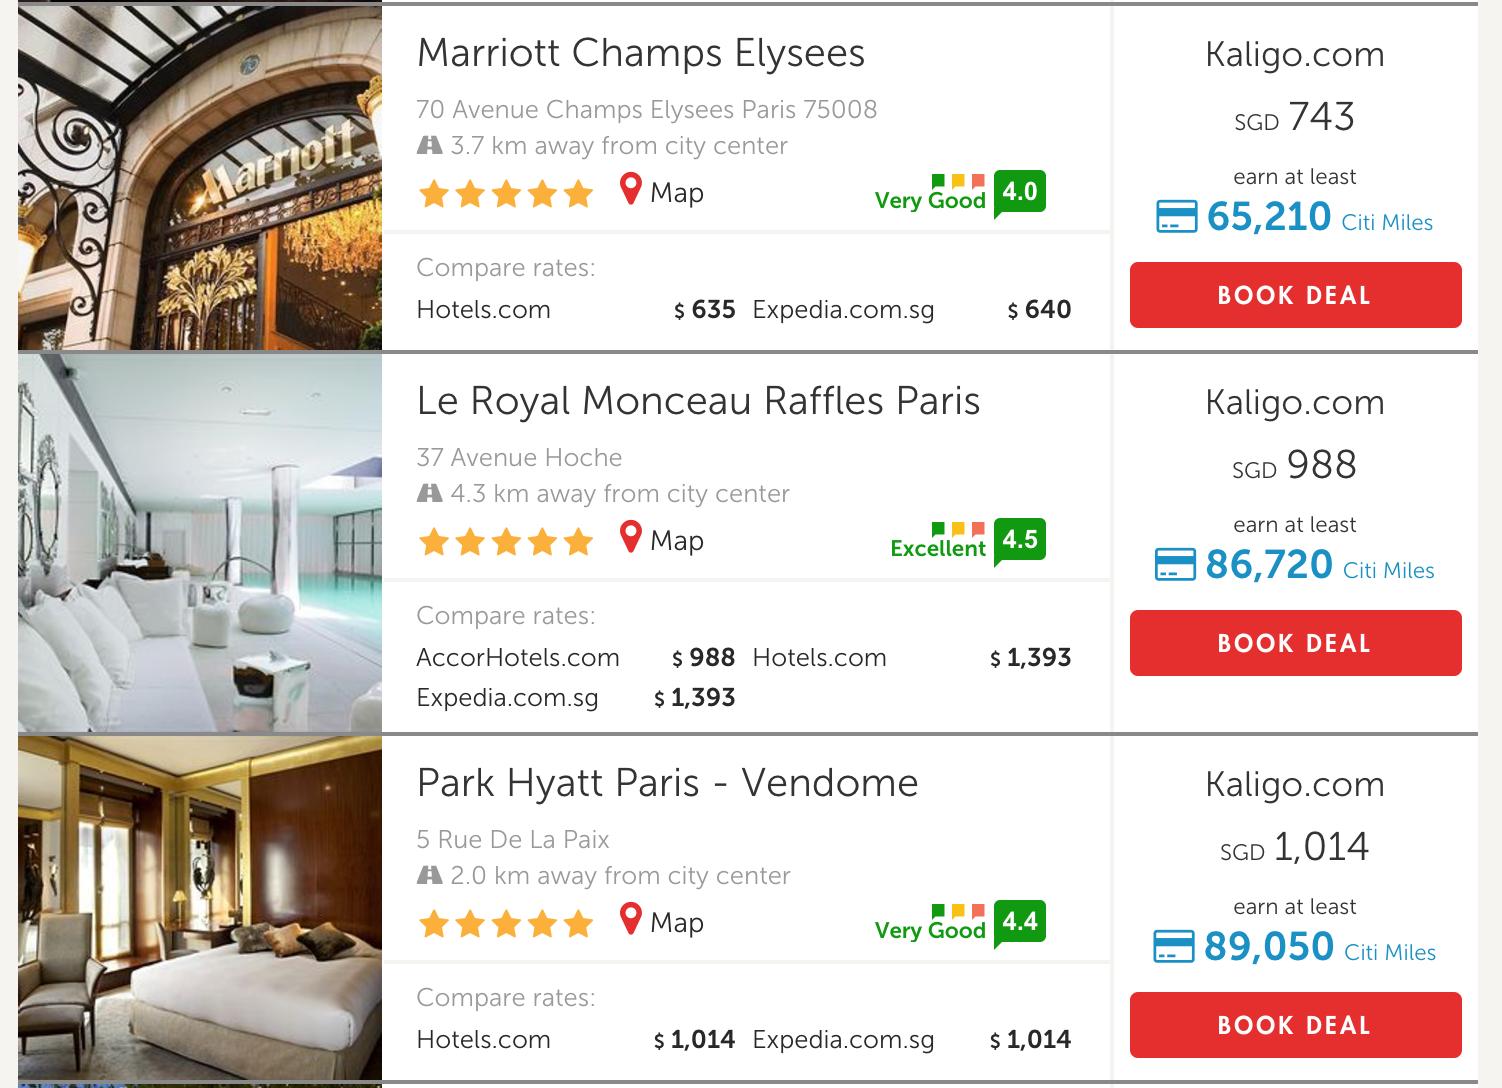 Rake Up Miles with Hotel Stays on Kaligo